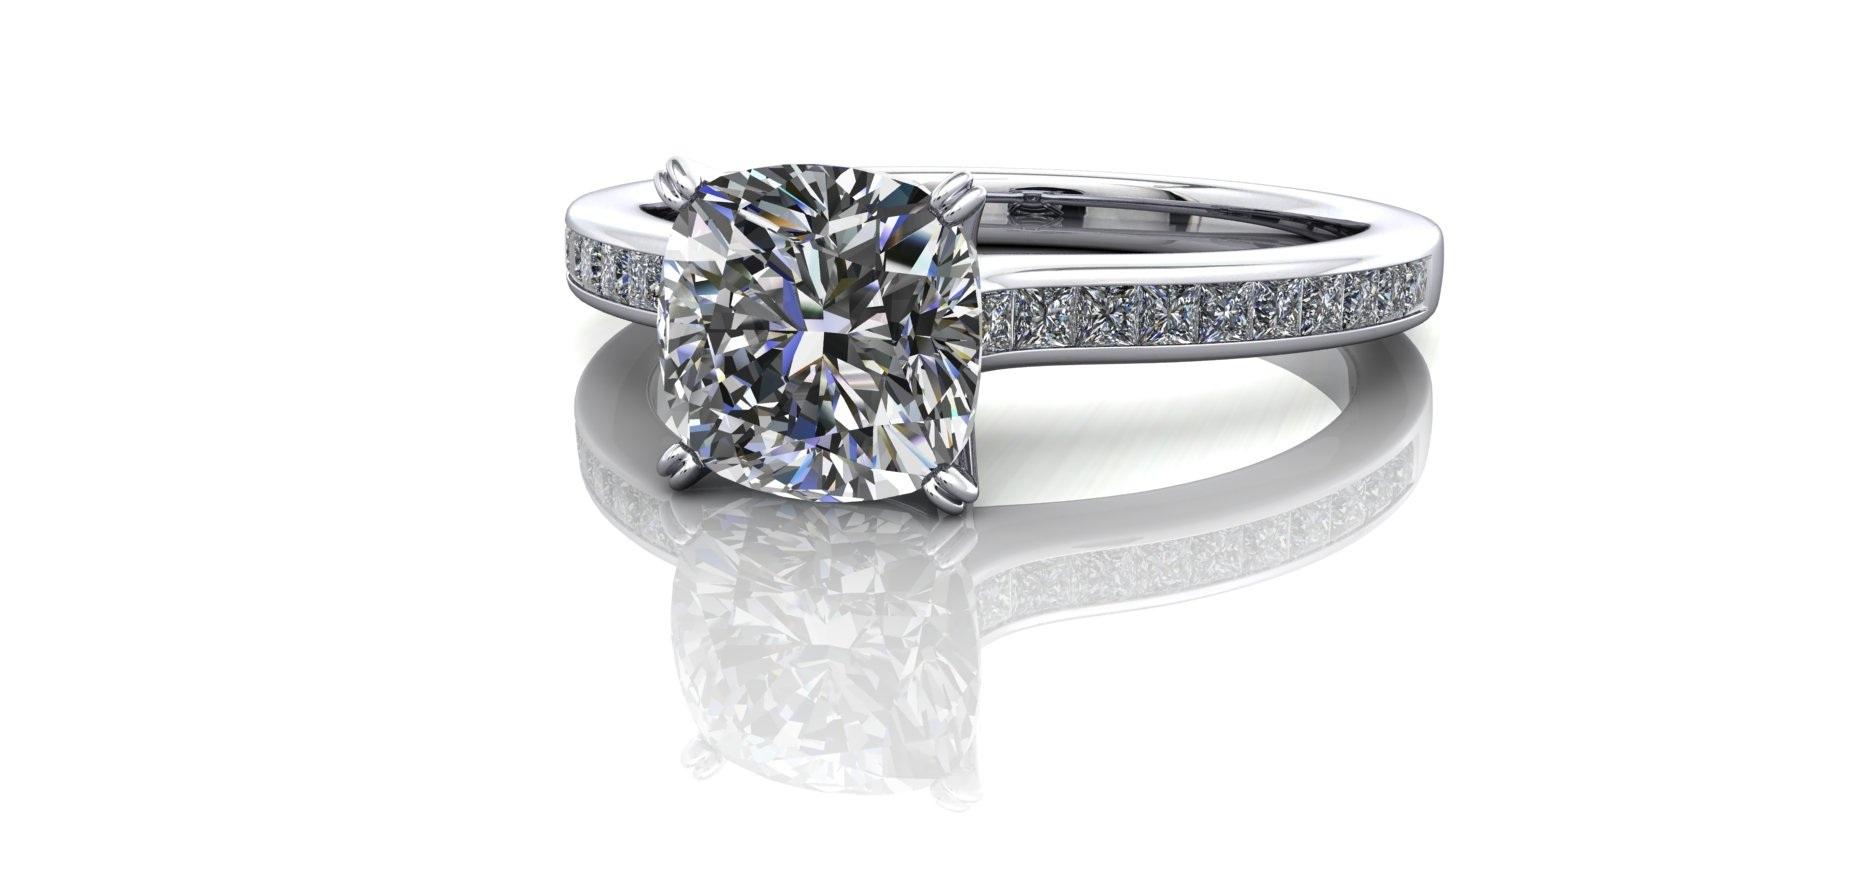 Cushion+cut+diamond+engagement+ring.jpg